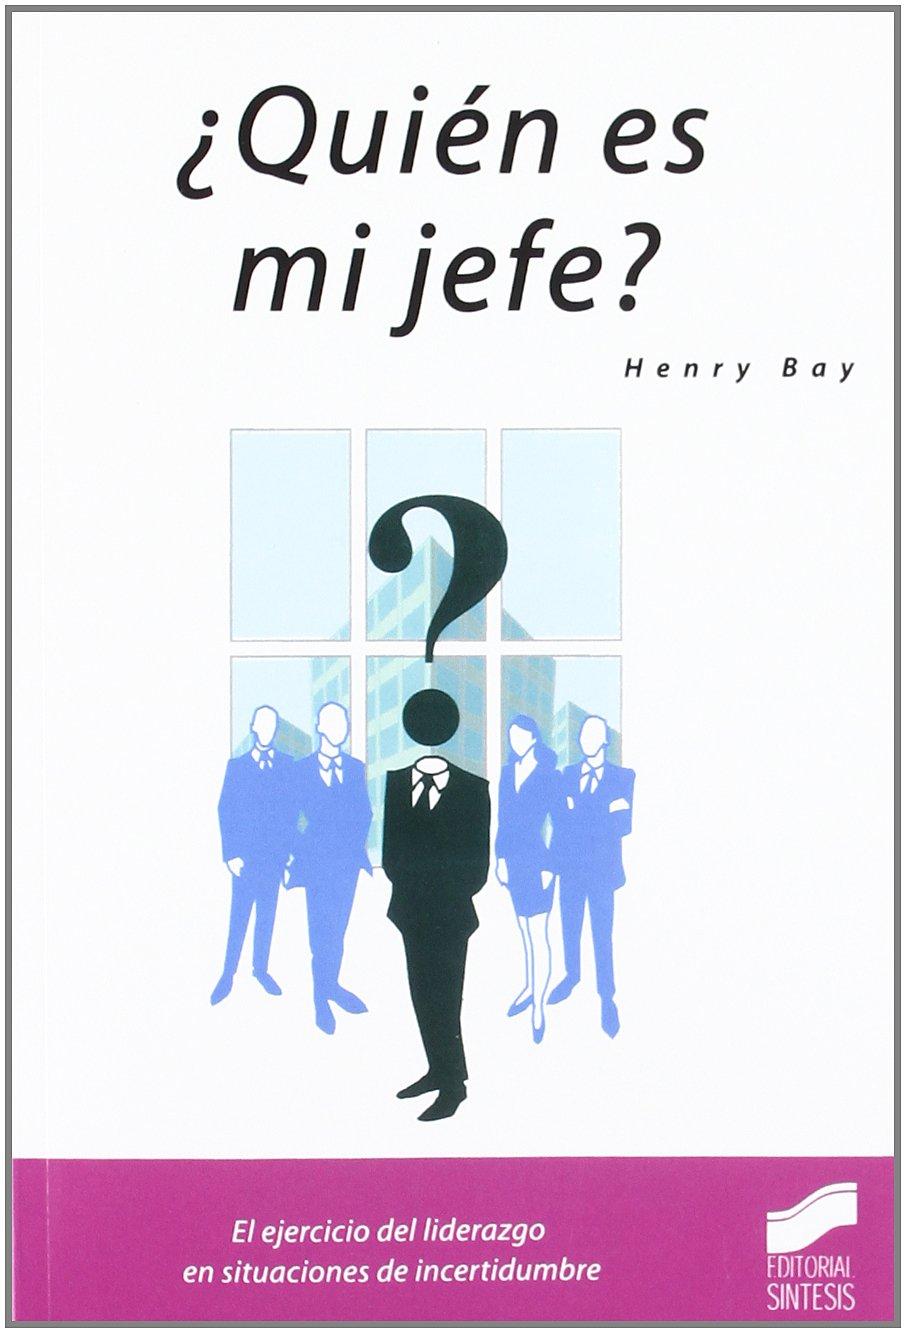 Quién es mi jefe?: Henry Bay: 9788497560924: Amazon.com: Books